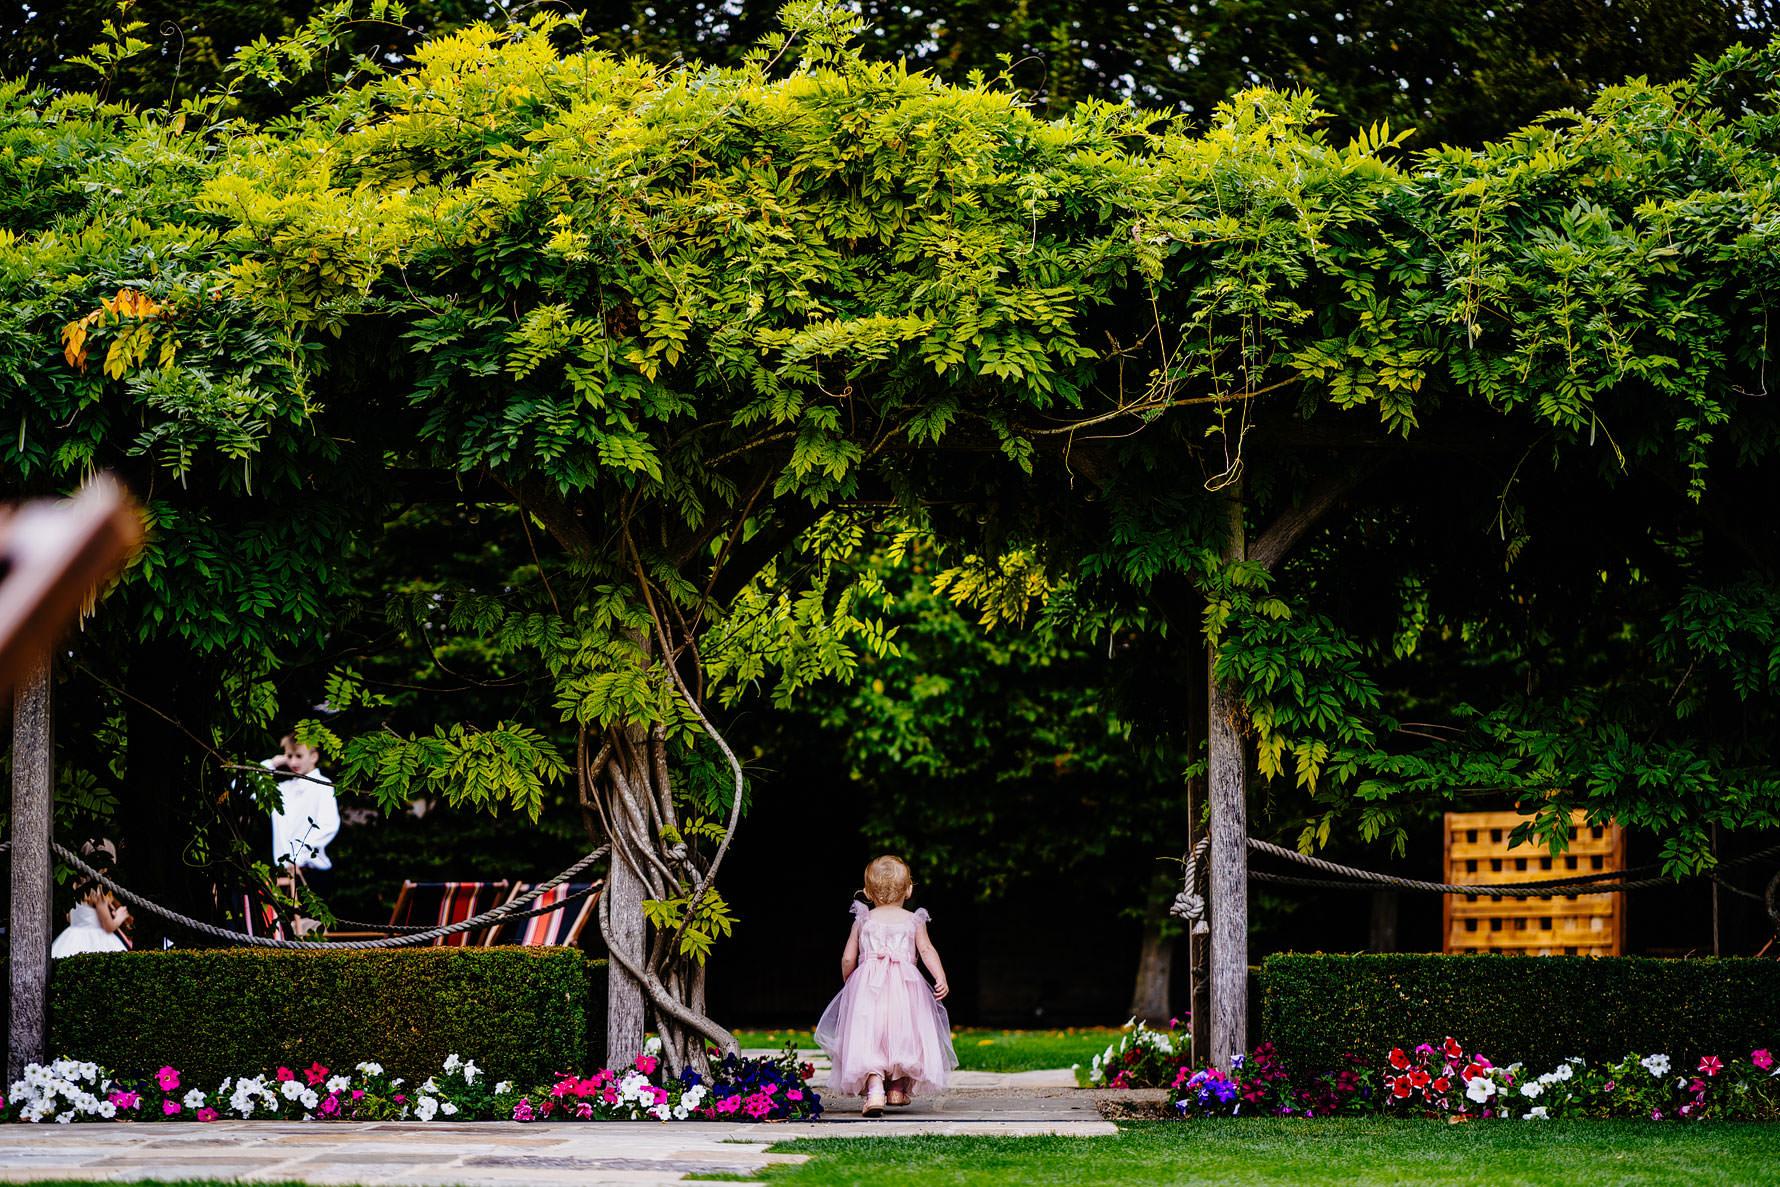 an infant at a wedding